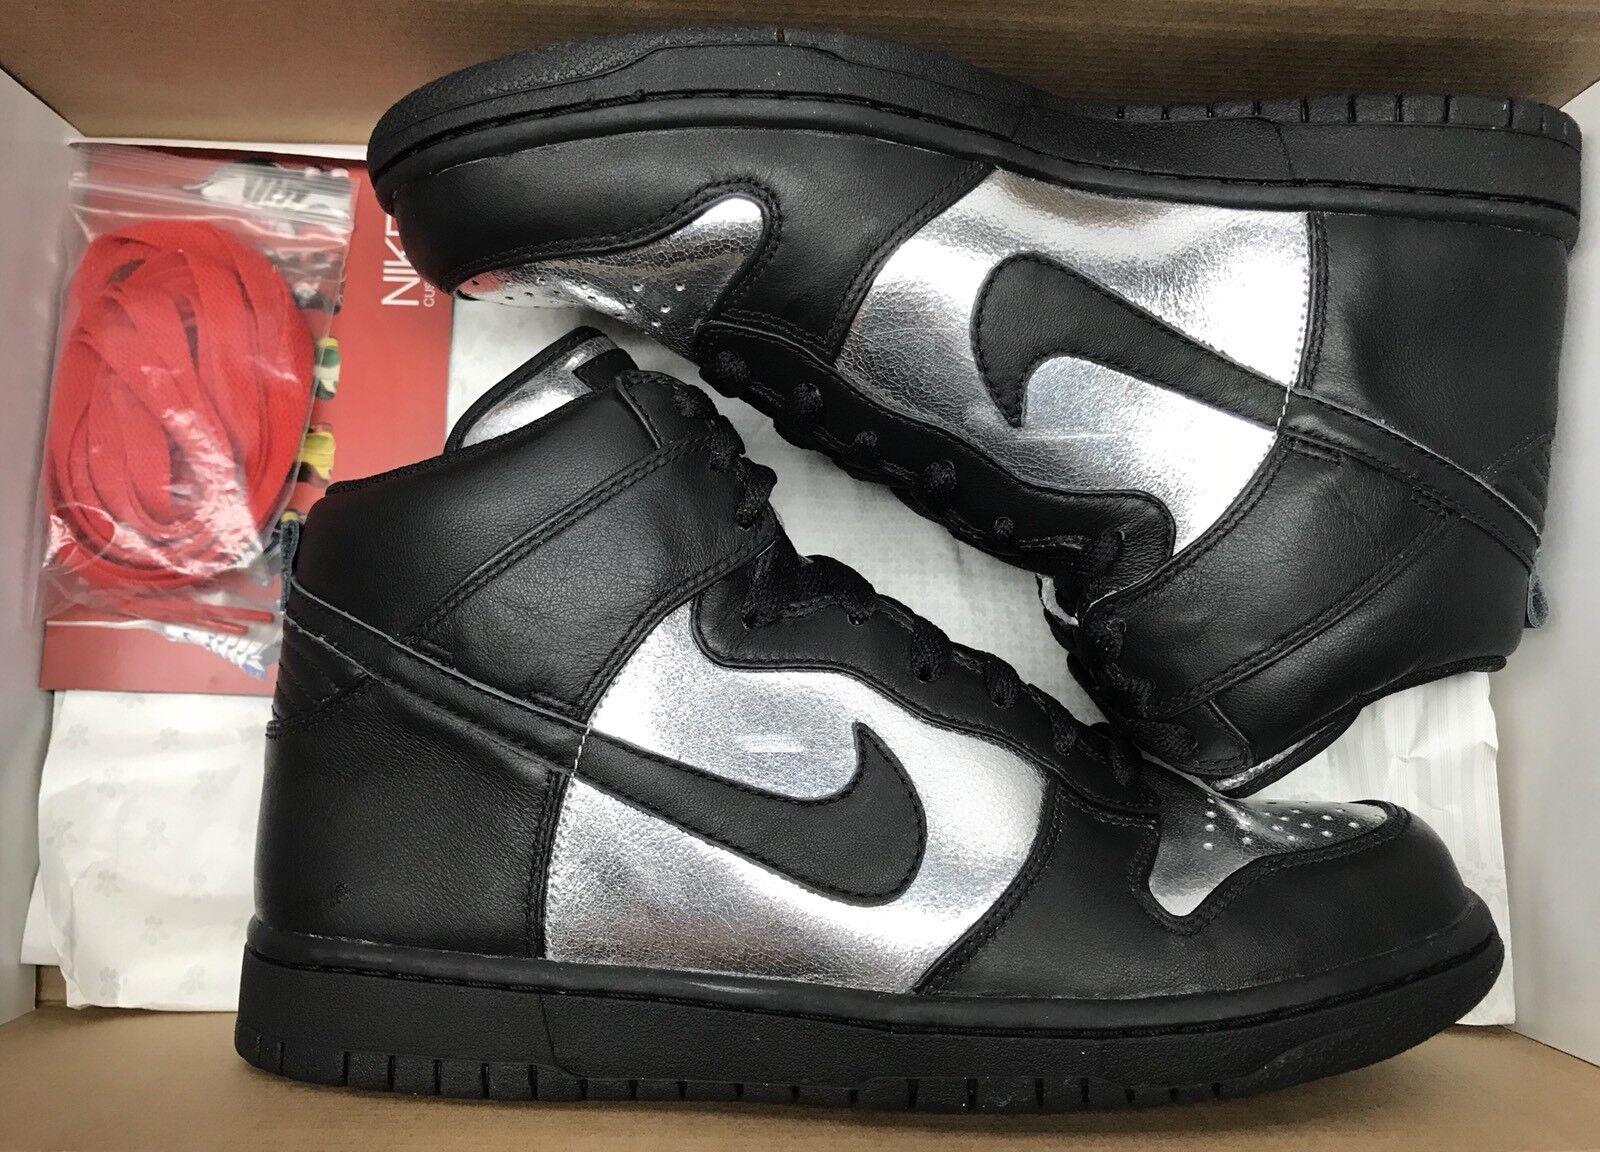 2008 Nike Dunk High ID Black Metallic Silver Chrome SB 332299-992 Sz 9.5